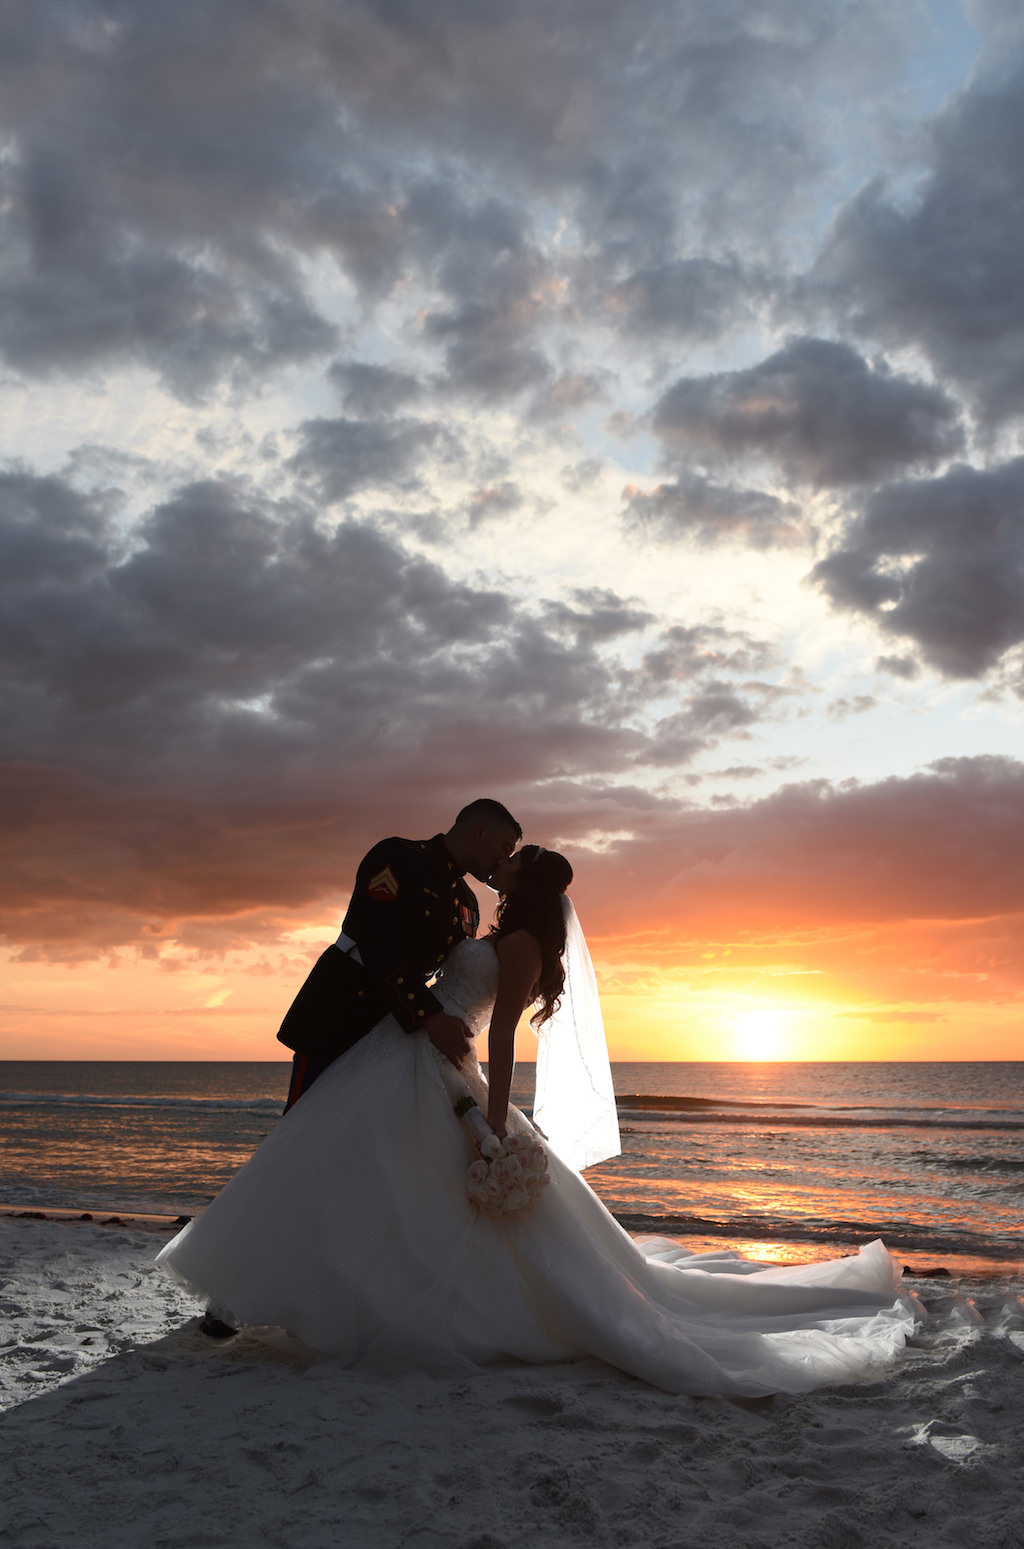 Sunset Beach Wedding Portrait Groom In